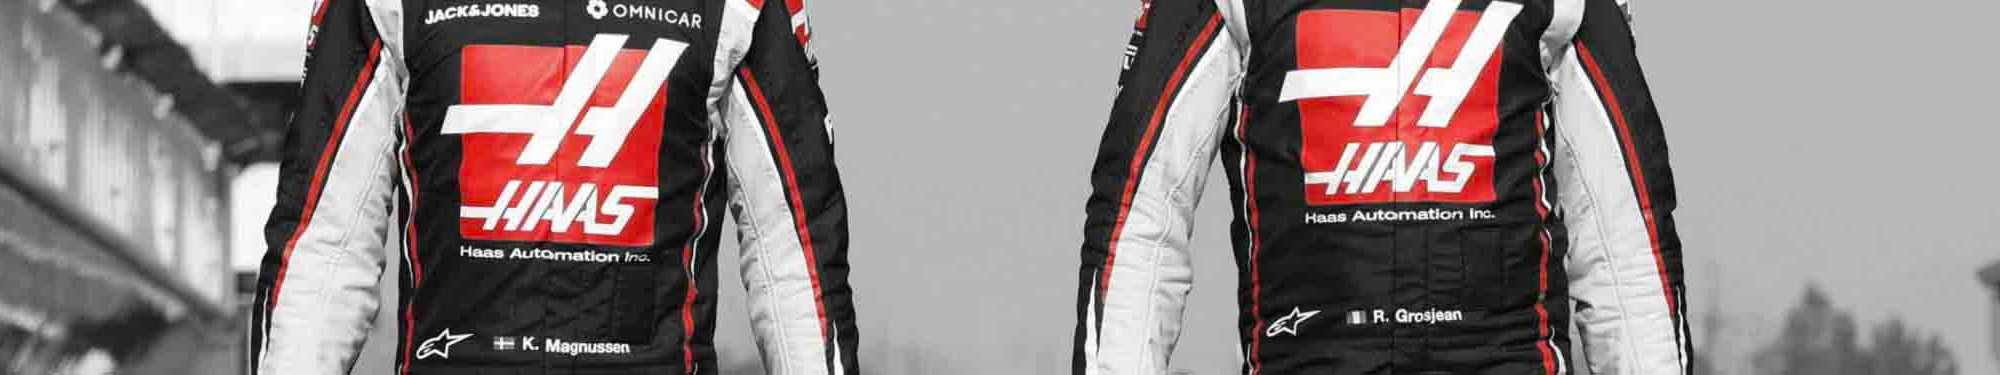 Grosjean, Magnussen lämnar Haas